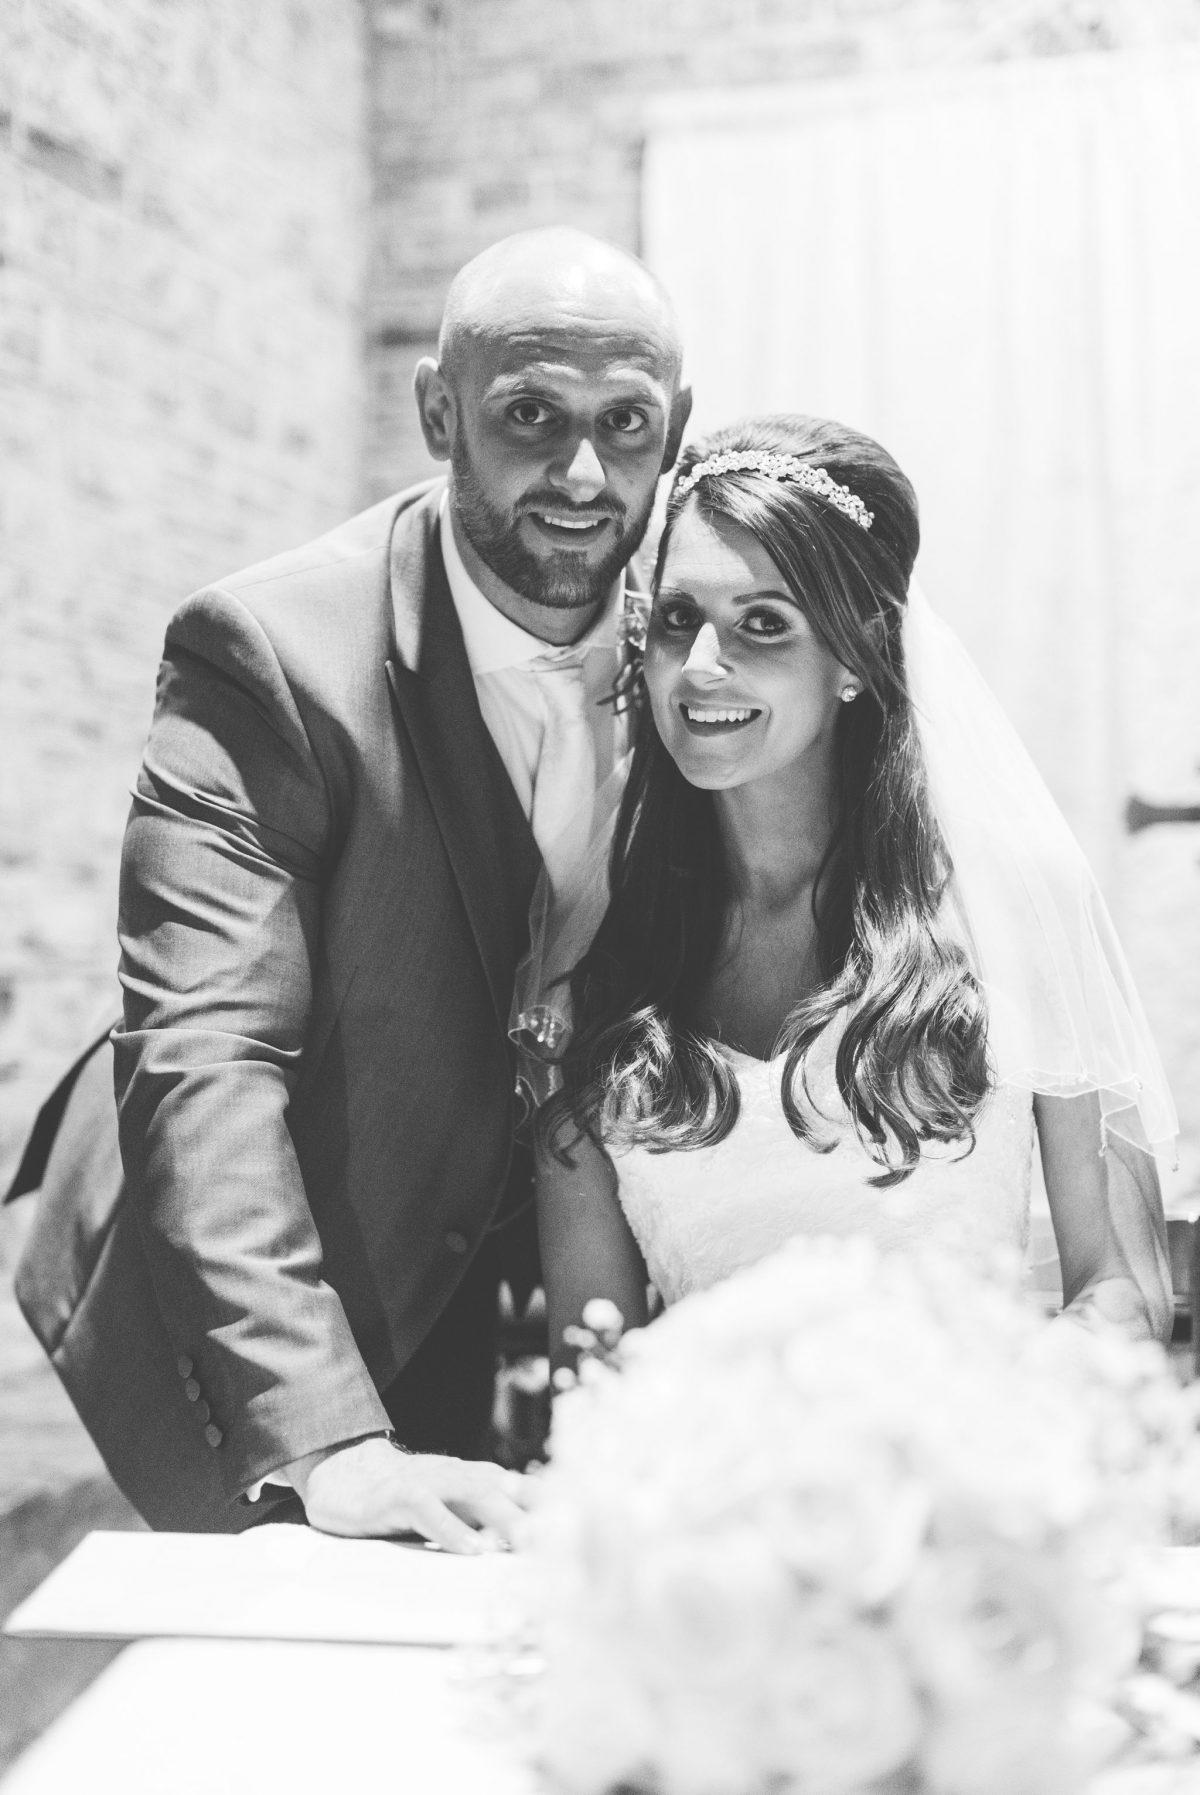 welsh_wedding_photographer_rachel_lambert_photography_decourceys_cardiff_rhiannon_gavin_ 30